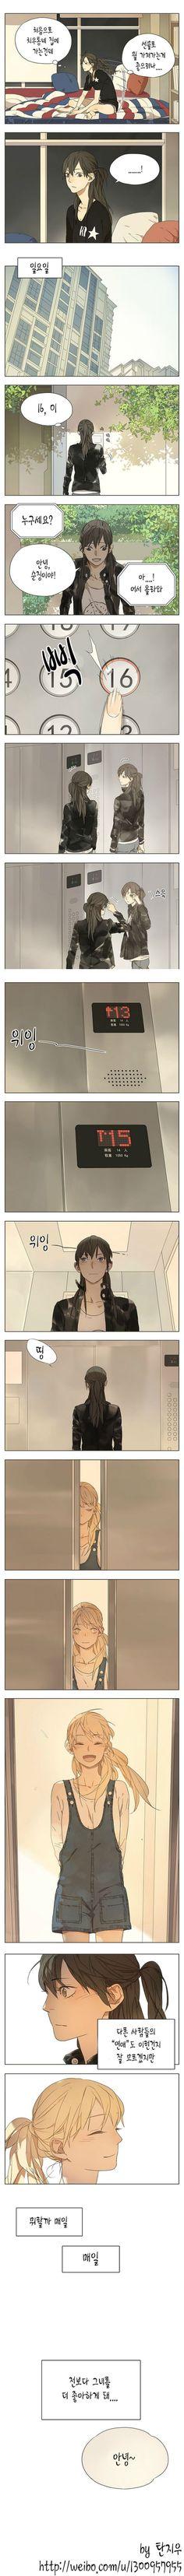 New TOWA Generation : [번역]탄지우 - 그들의 이야기 (원제:SQ) 56화